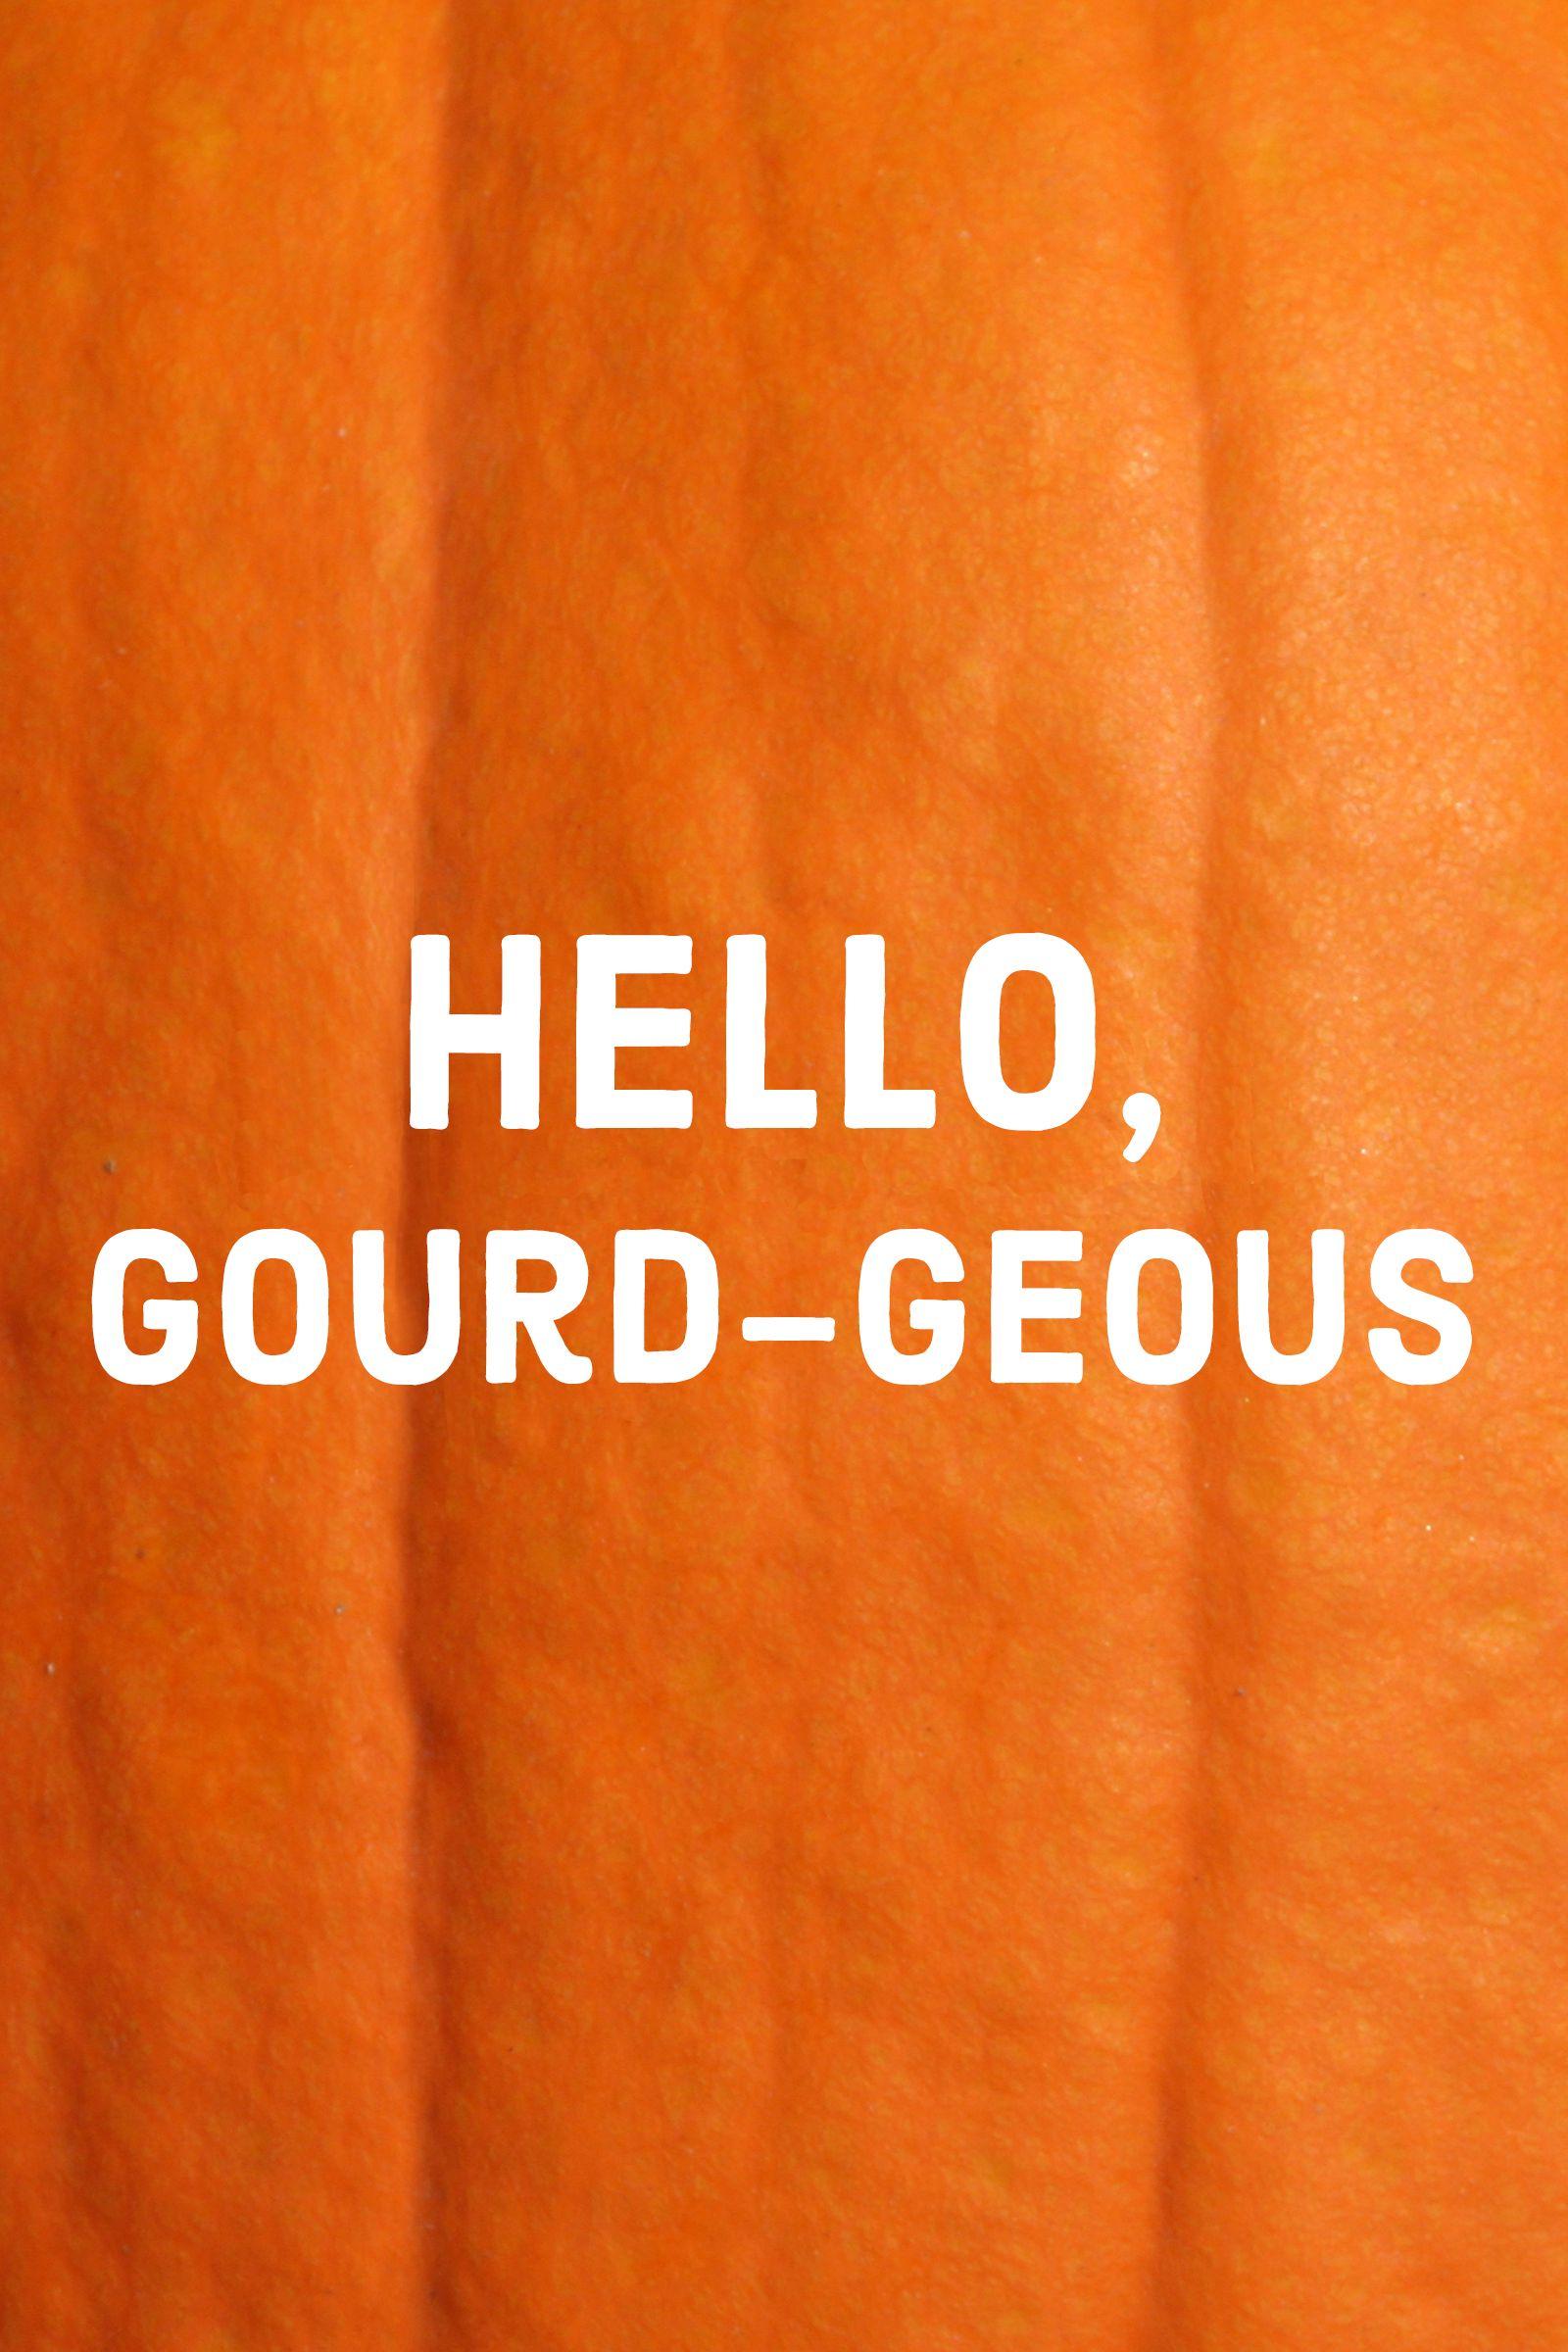 pumpkin quotes andpuns hello gourd-geous